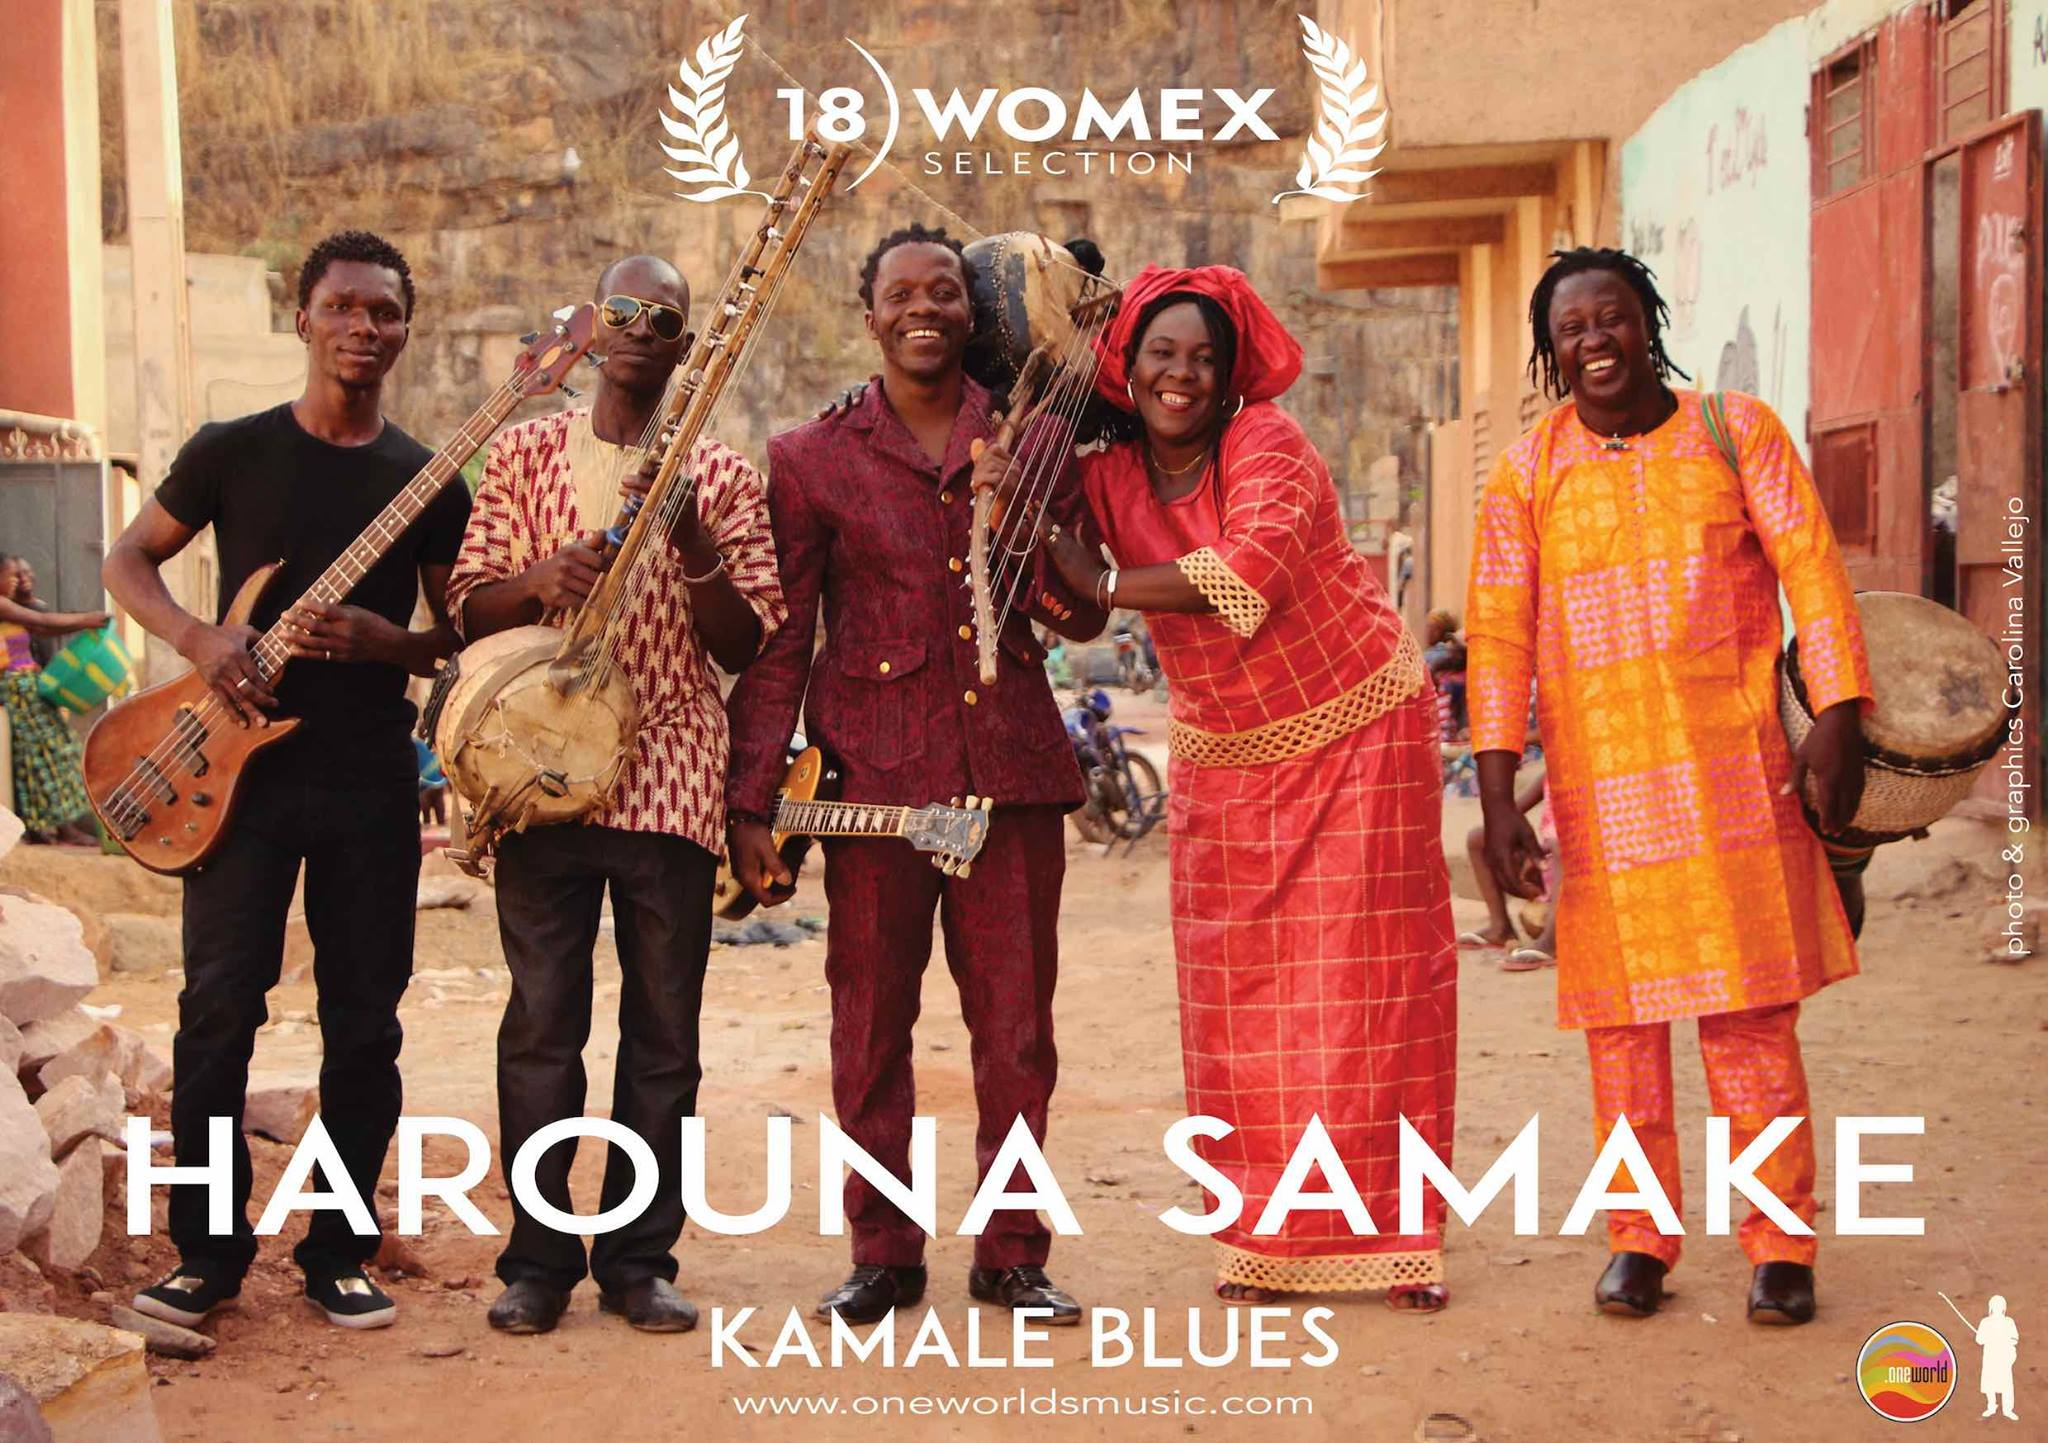 Harouna Samake